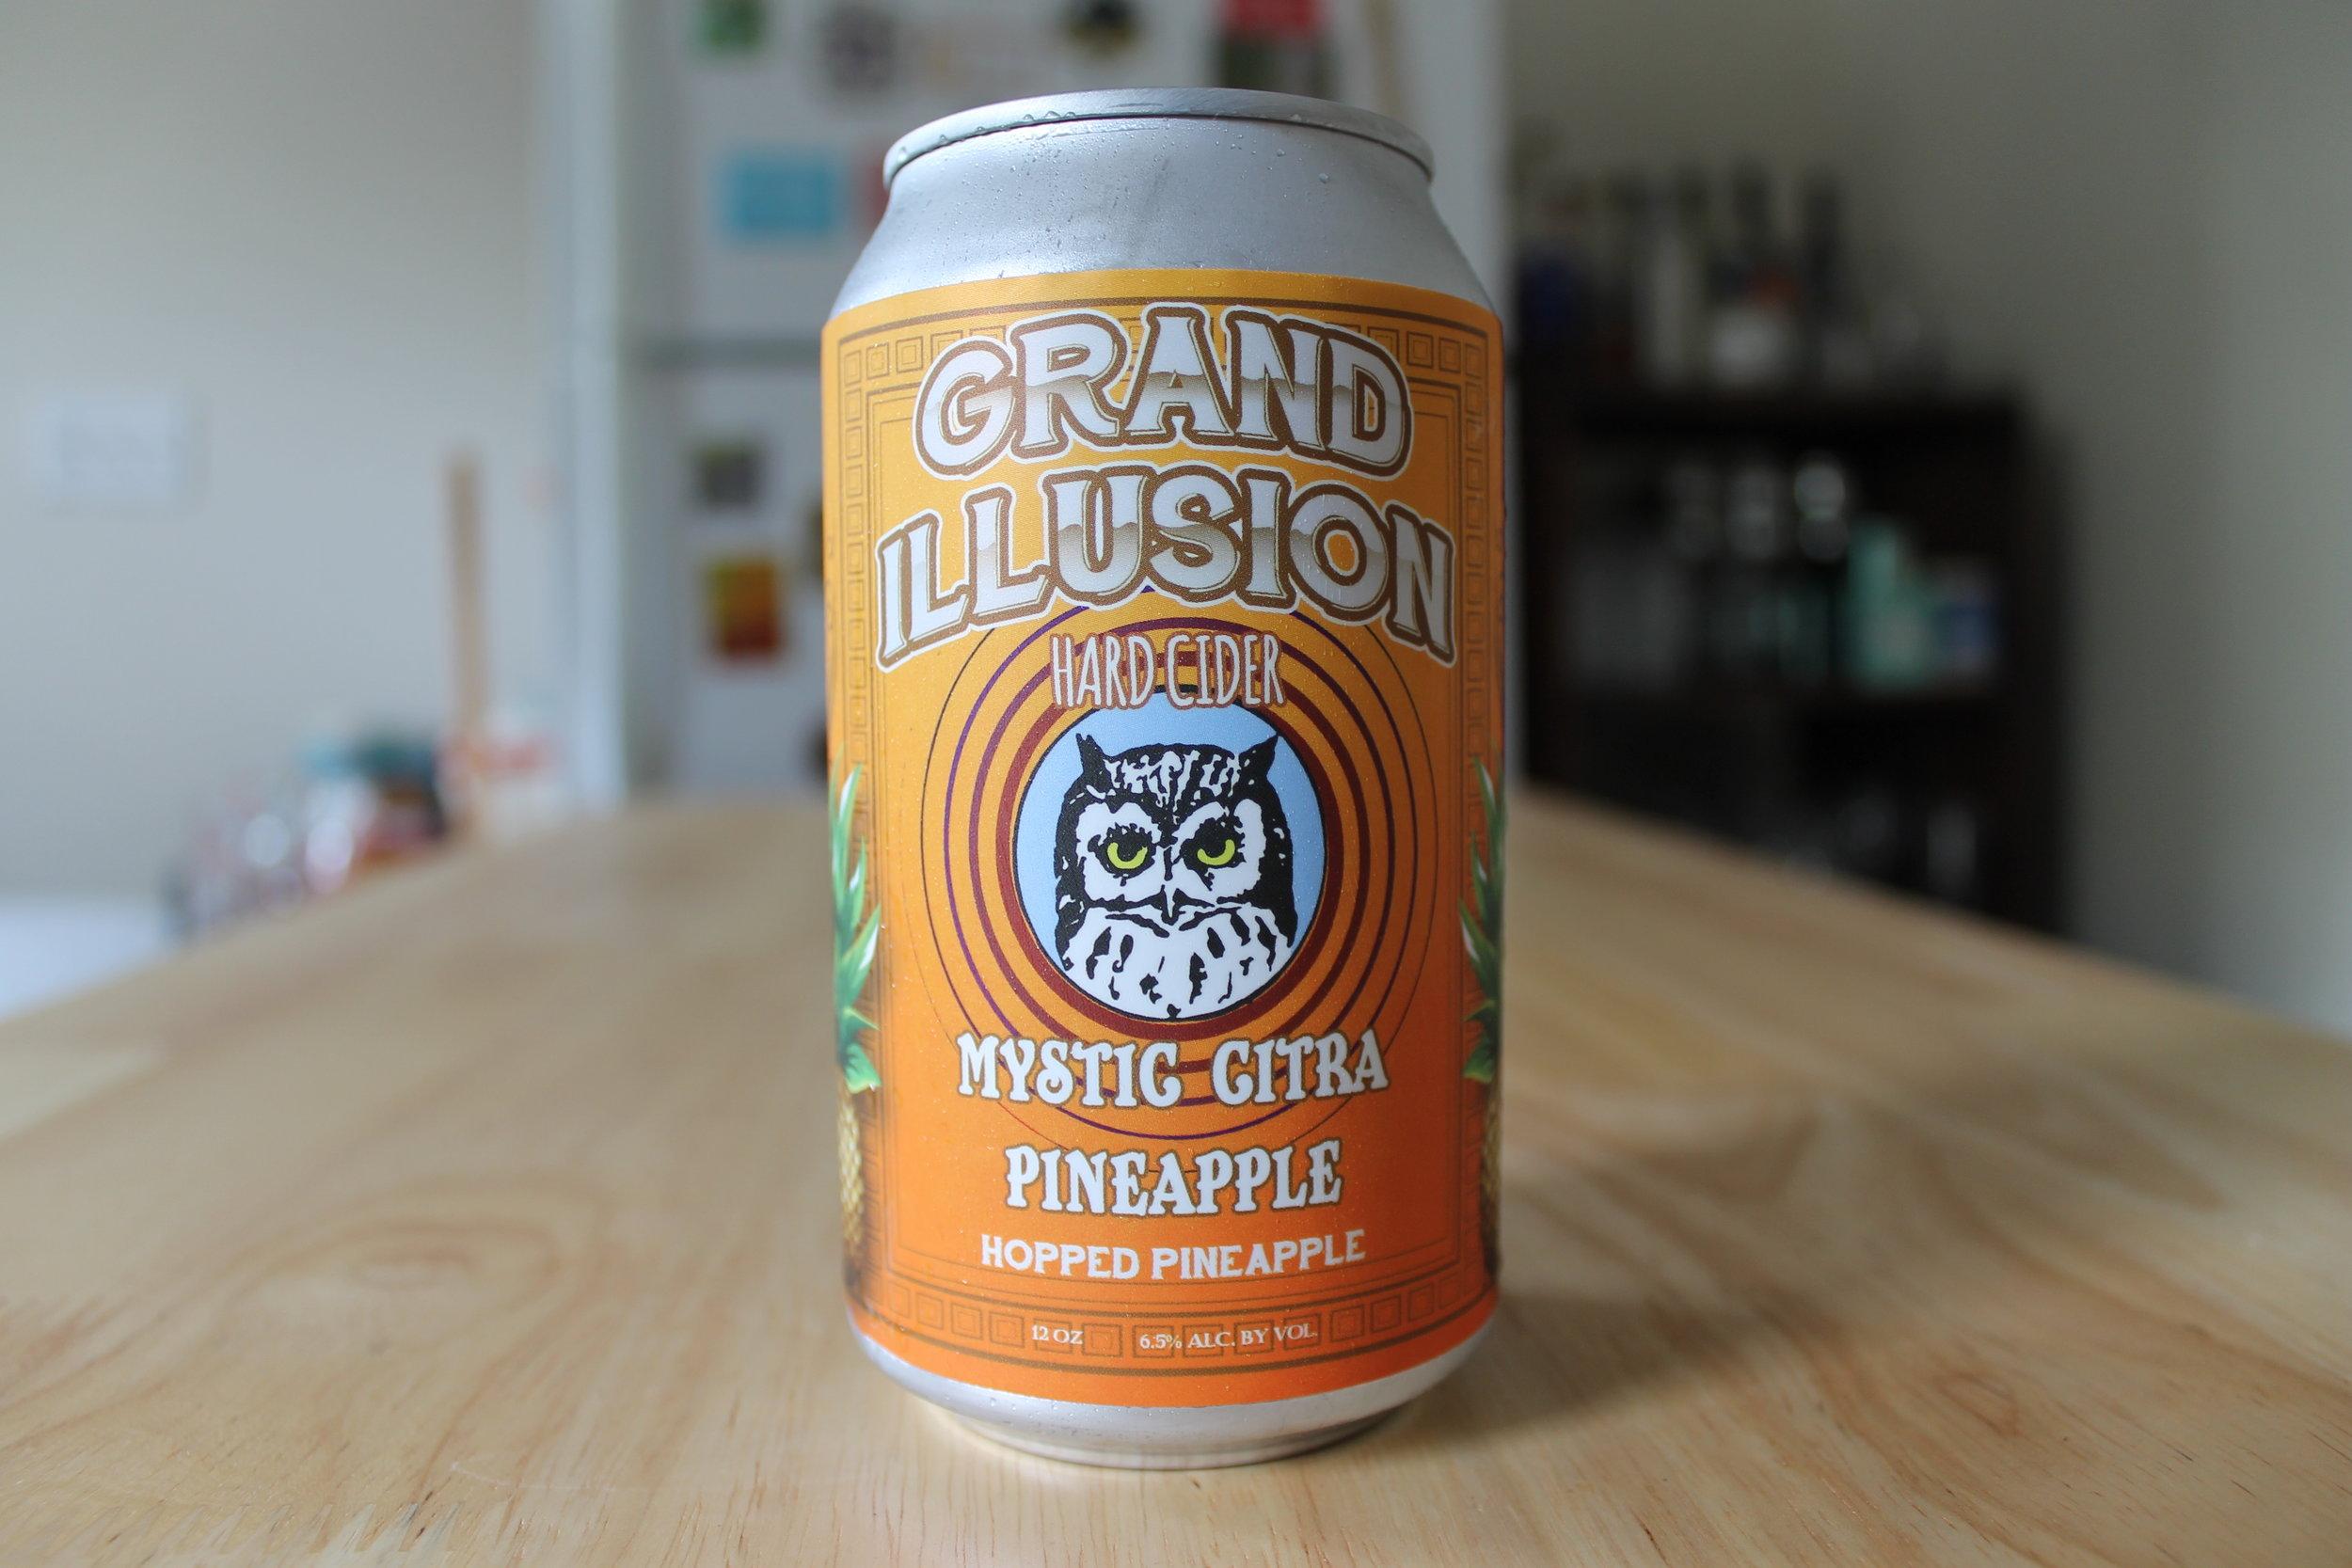 Grand Illusion: Mystic Citra Pineapple